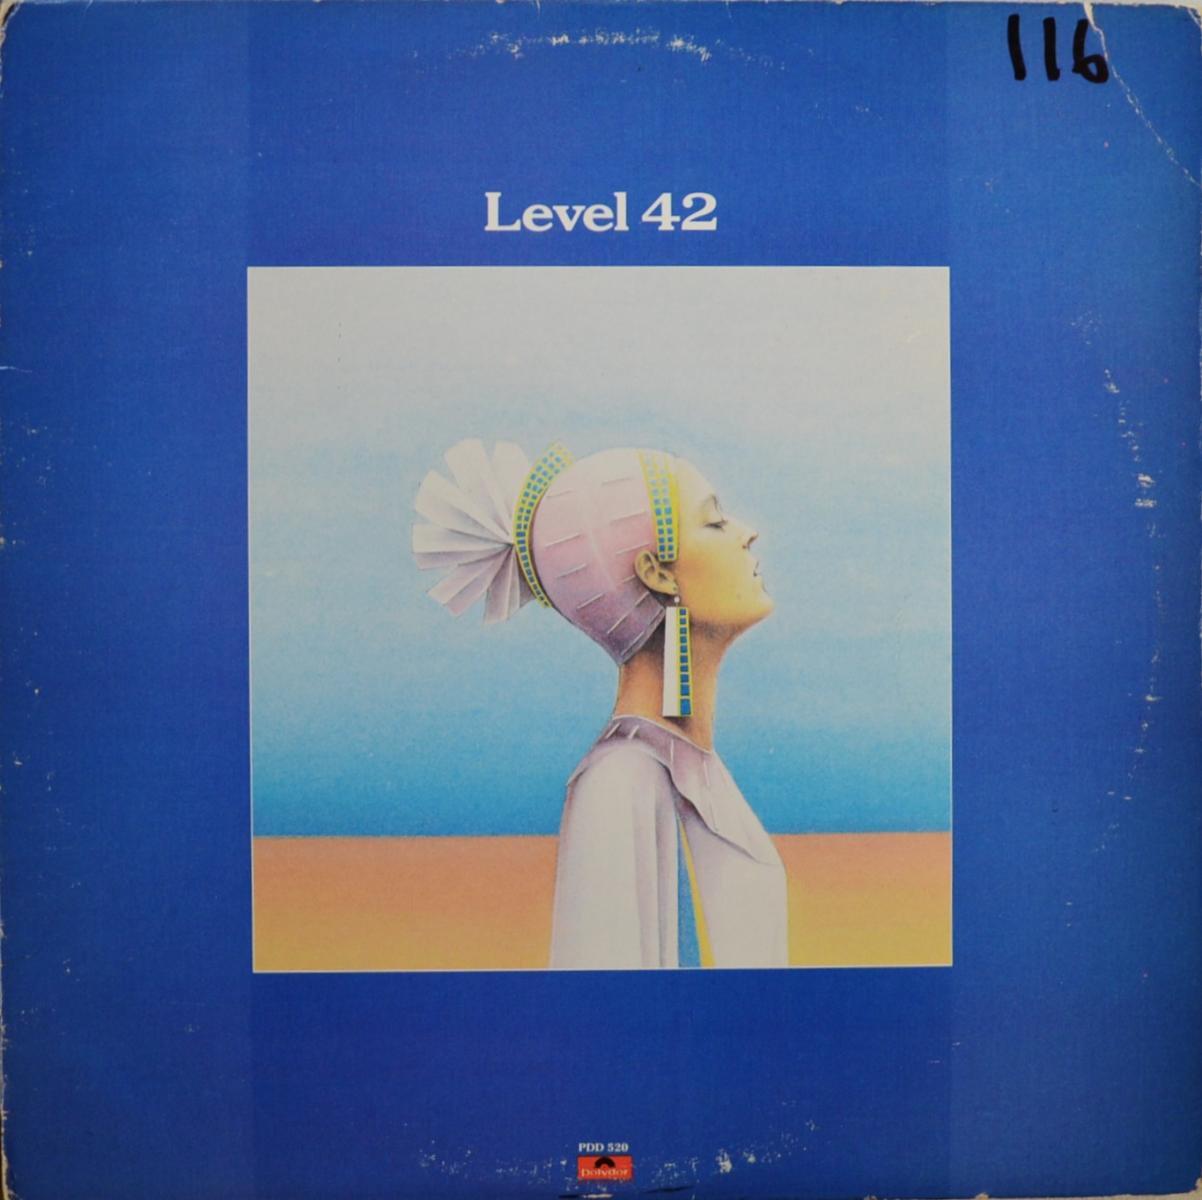 LEVEL 42 / STARCHILD (12